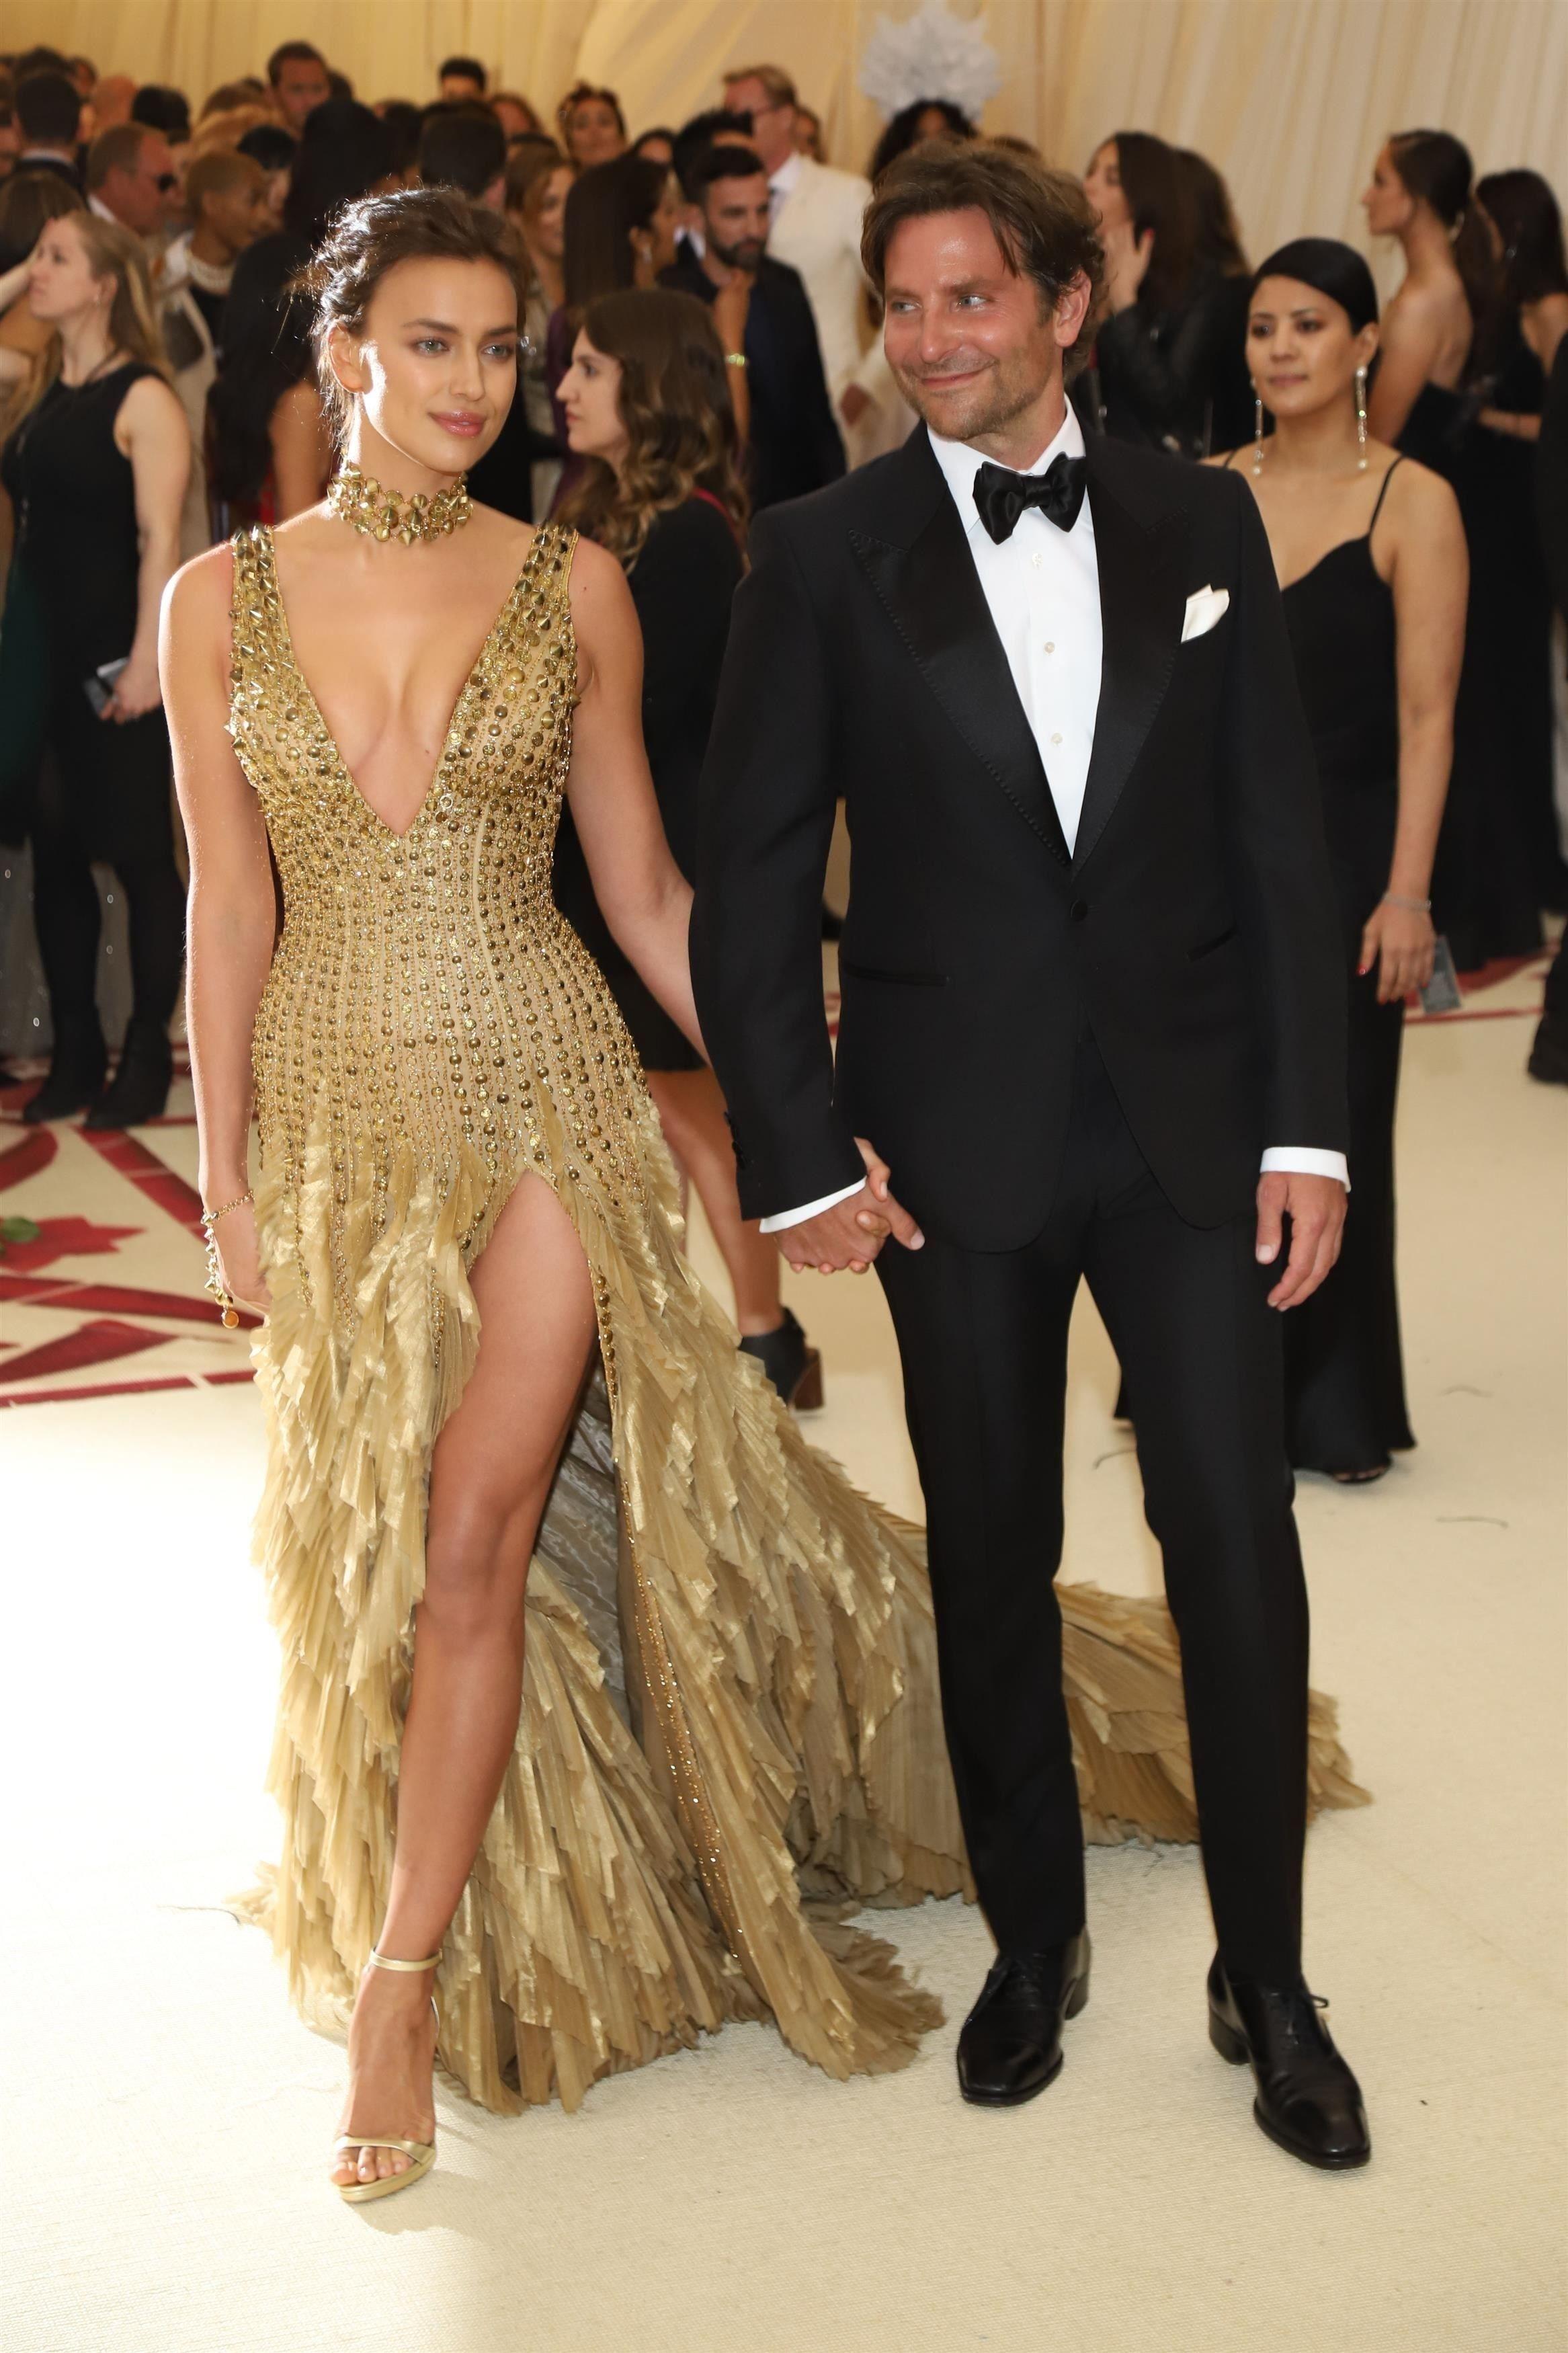 Irina Shayk preparing for the wedding with Bradley Cooper